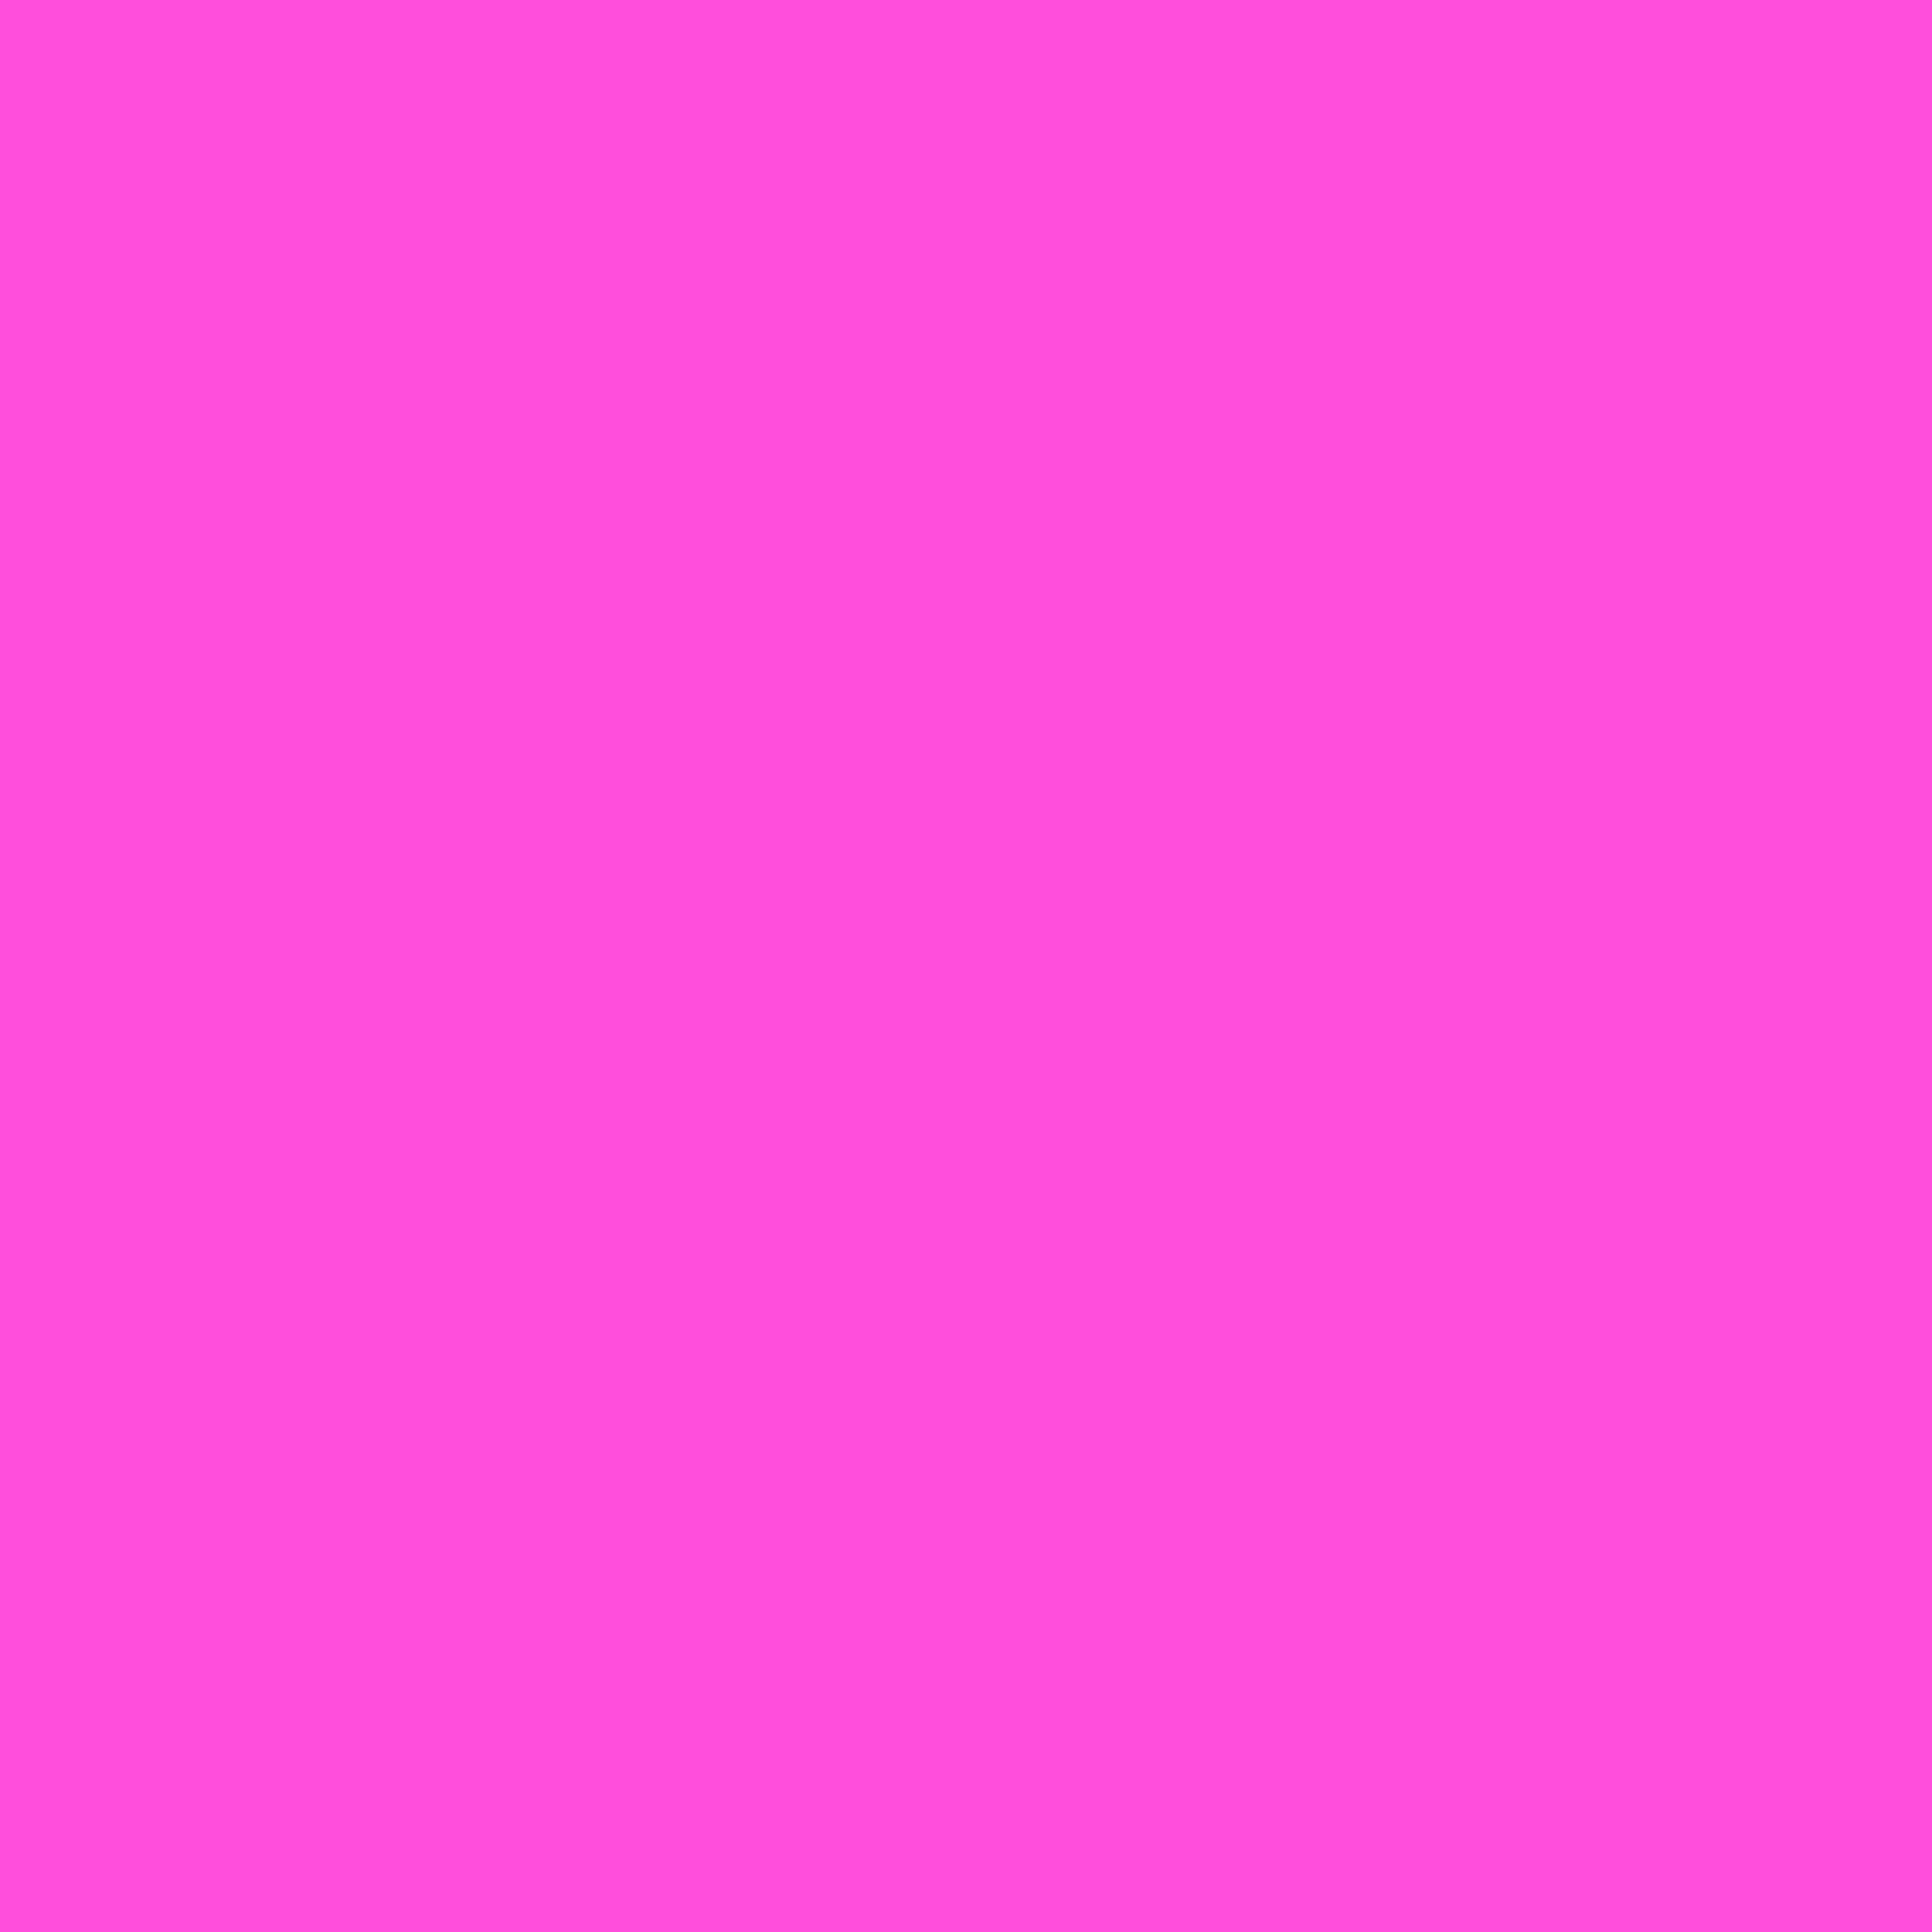 2732x2732 Purple Pizzazz Solid Color Background